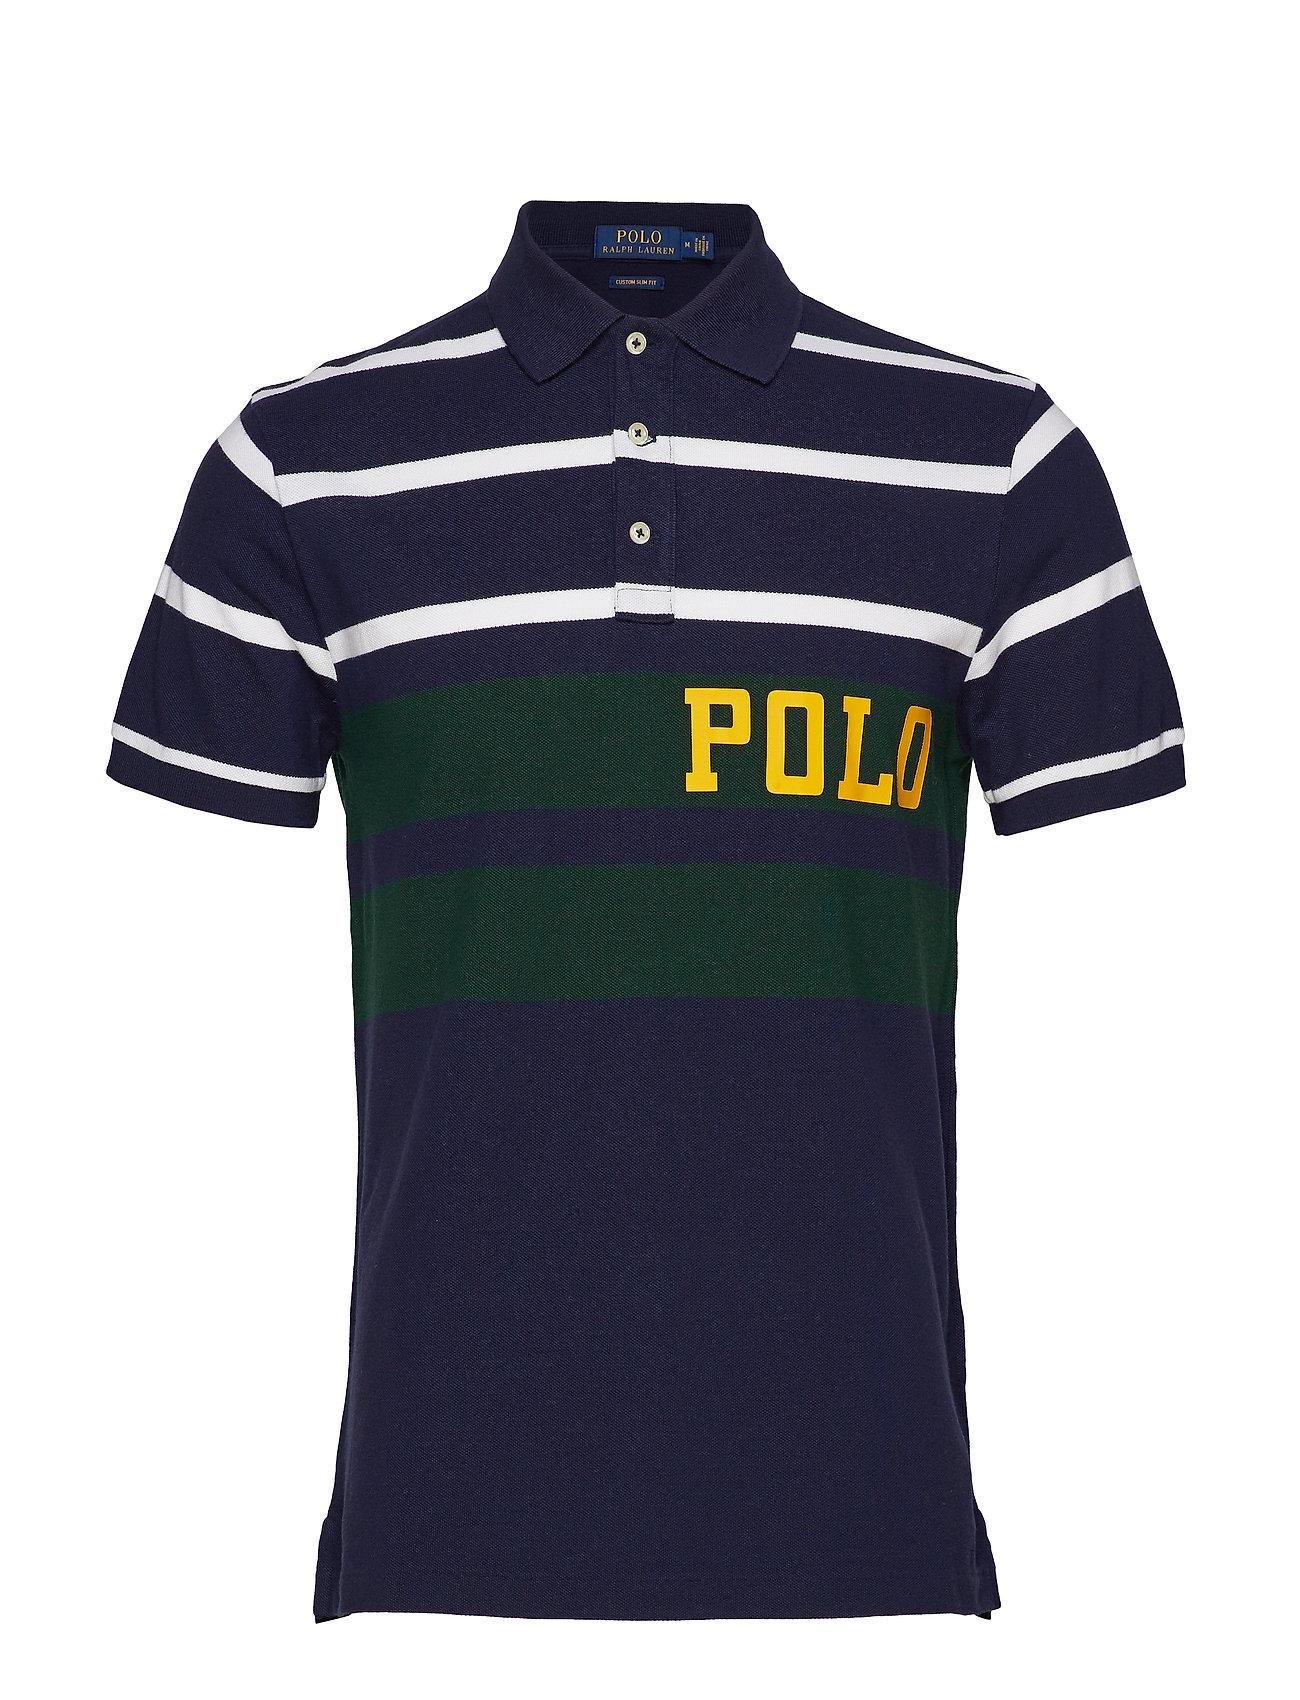 Polo Ralph Lauren Custom Slim Fit Mesh Polo - CRUISE NAVY MULTI